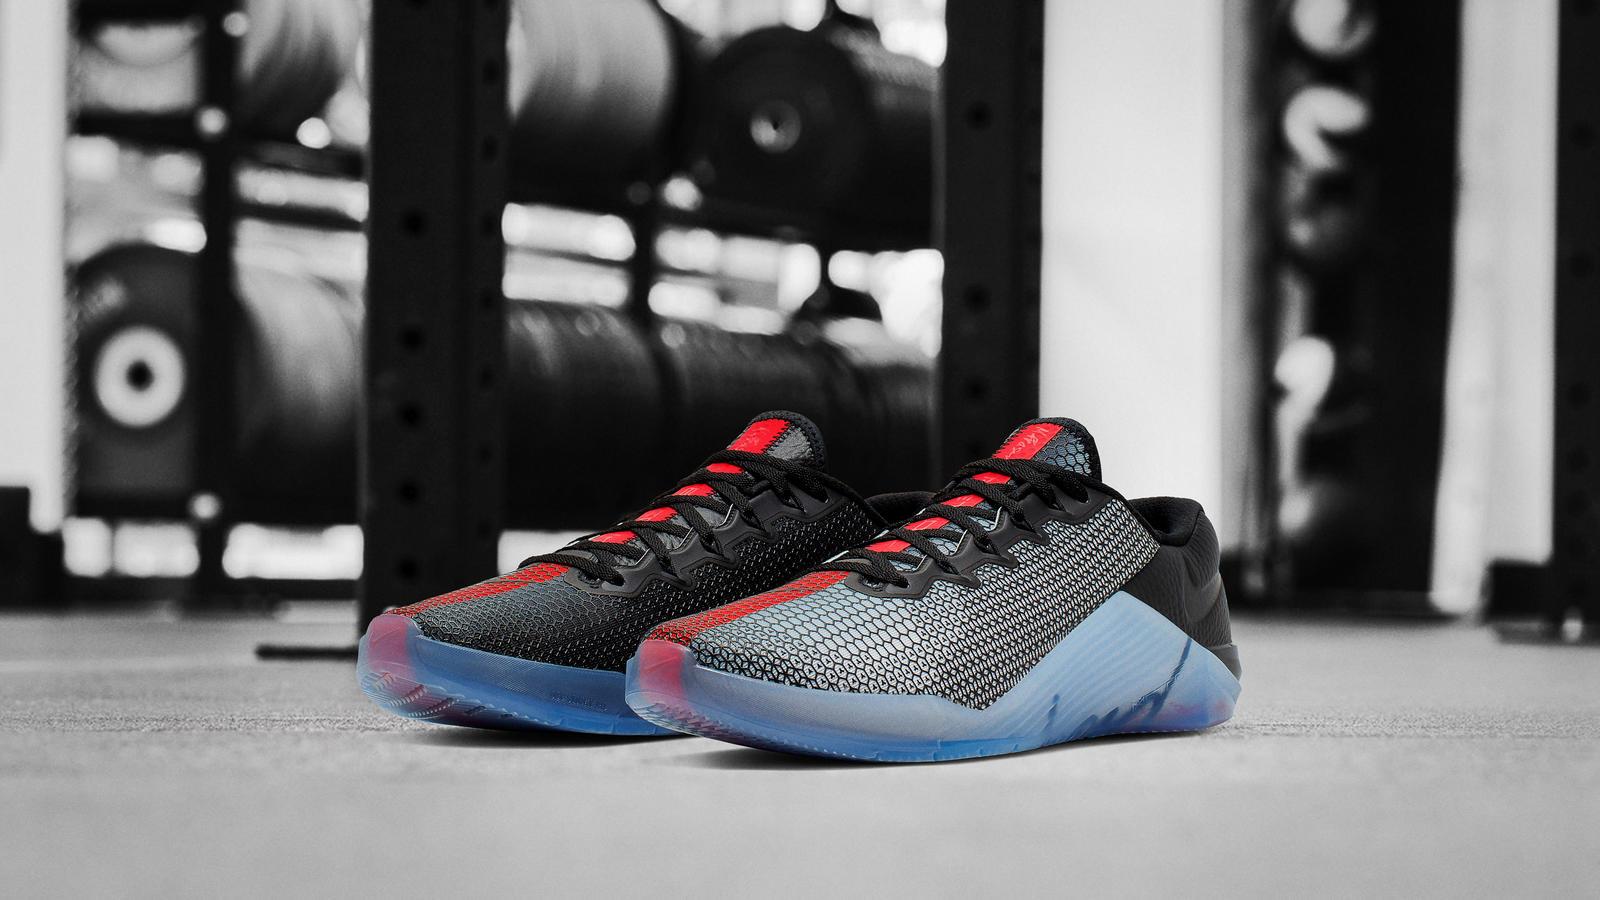 cfc33cde2dda7 Nike Metcon 5 Mat Fraser - Nike News